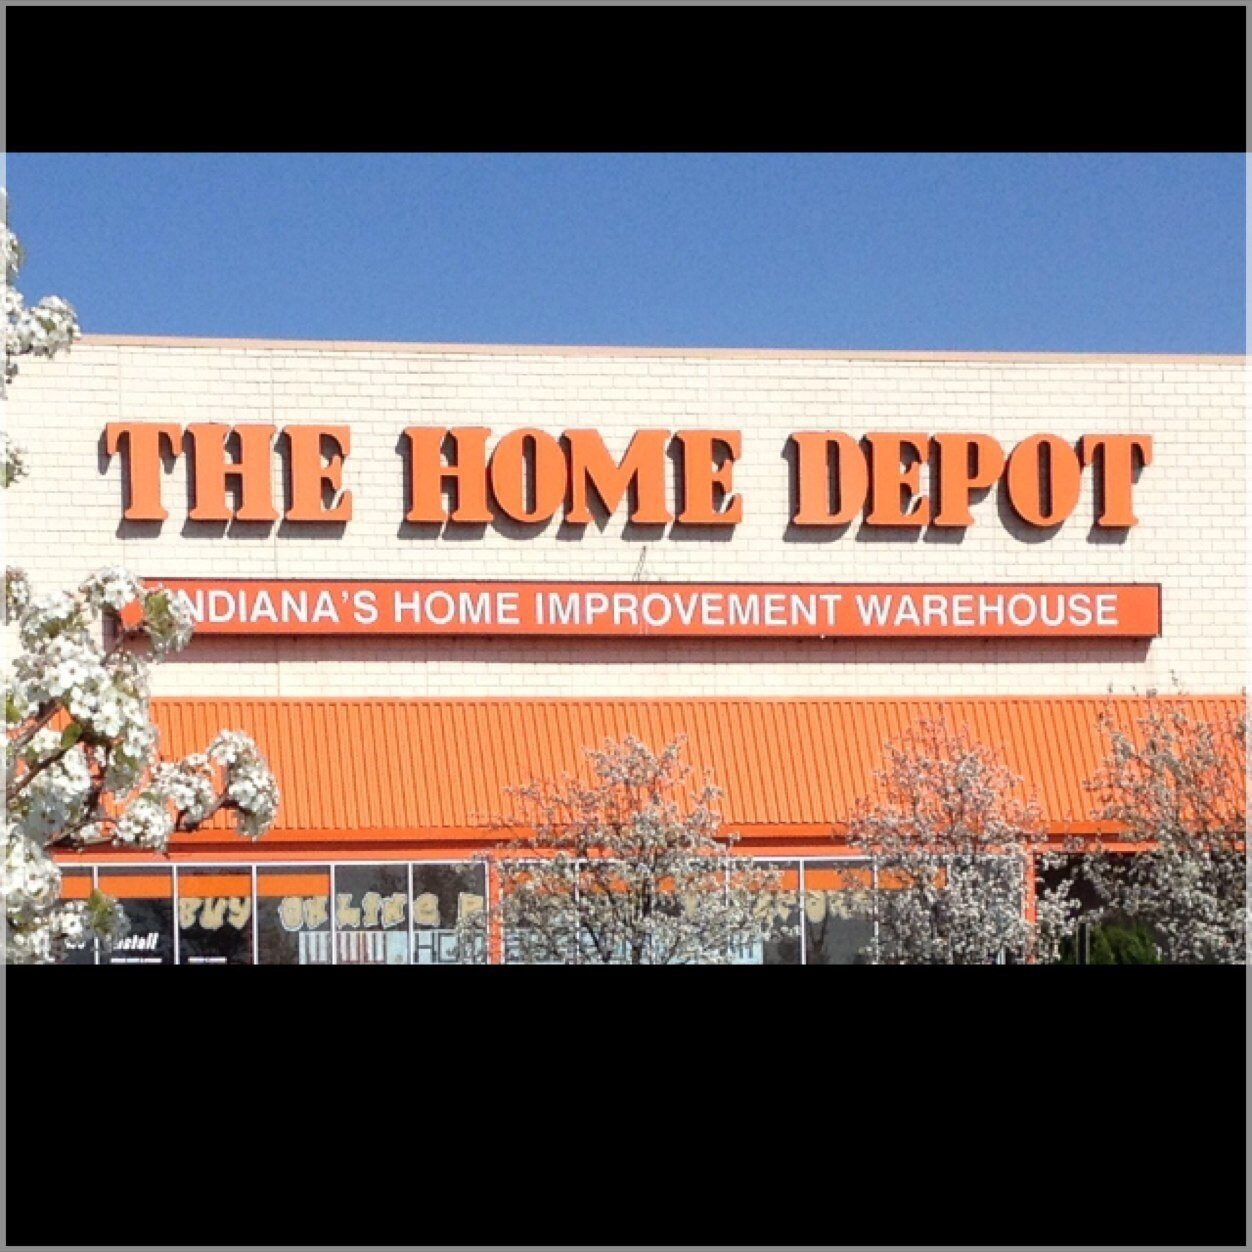 Home Depot West Evansville Indiana